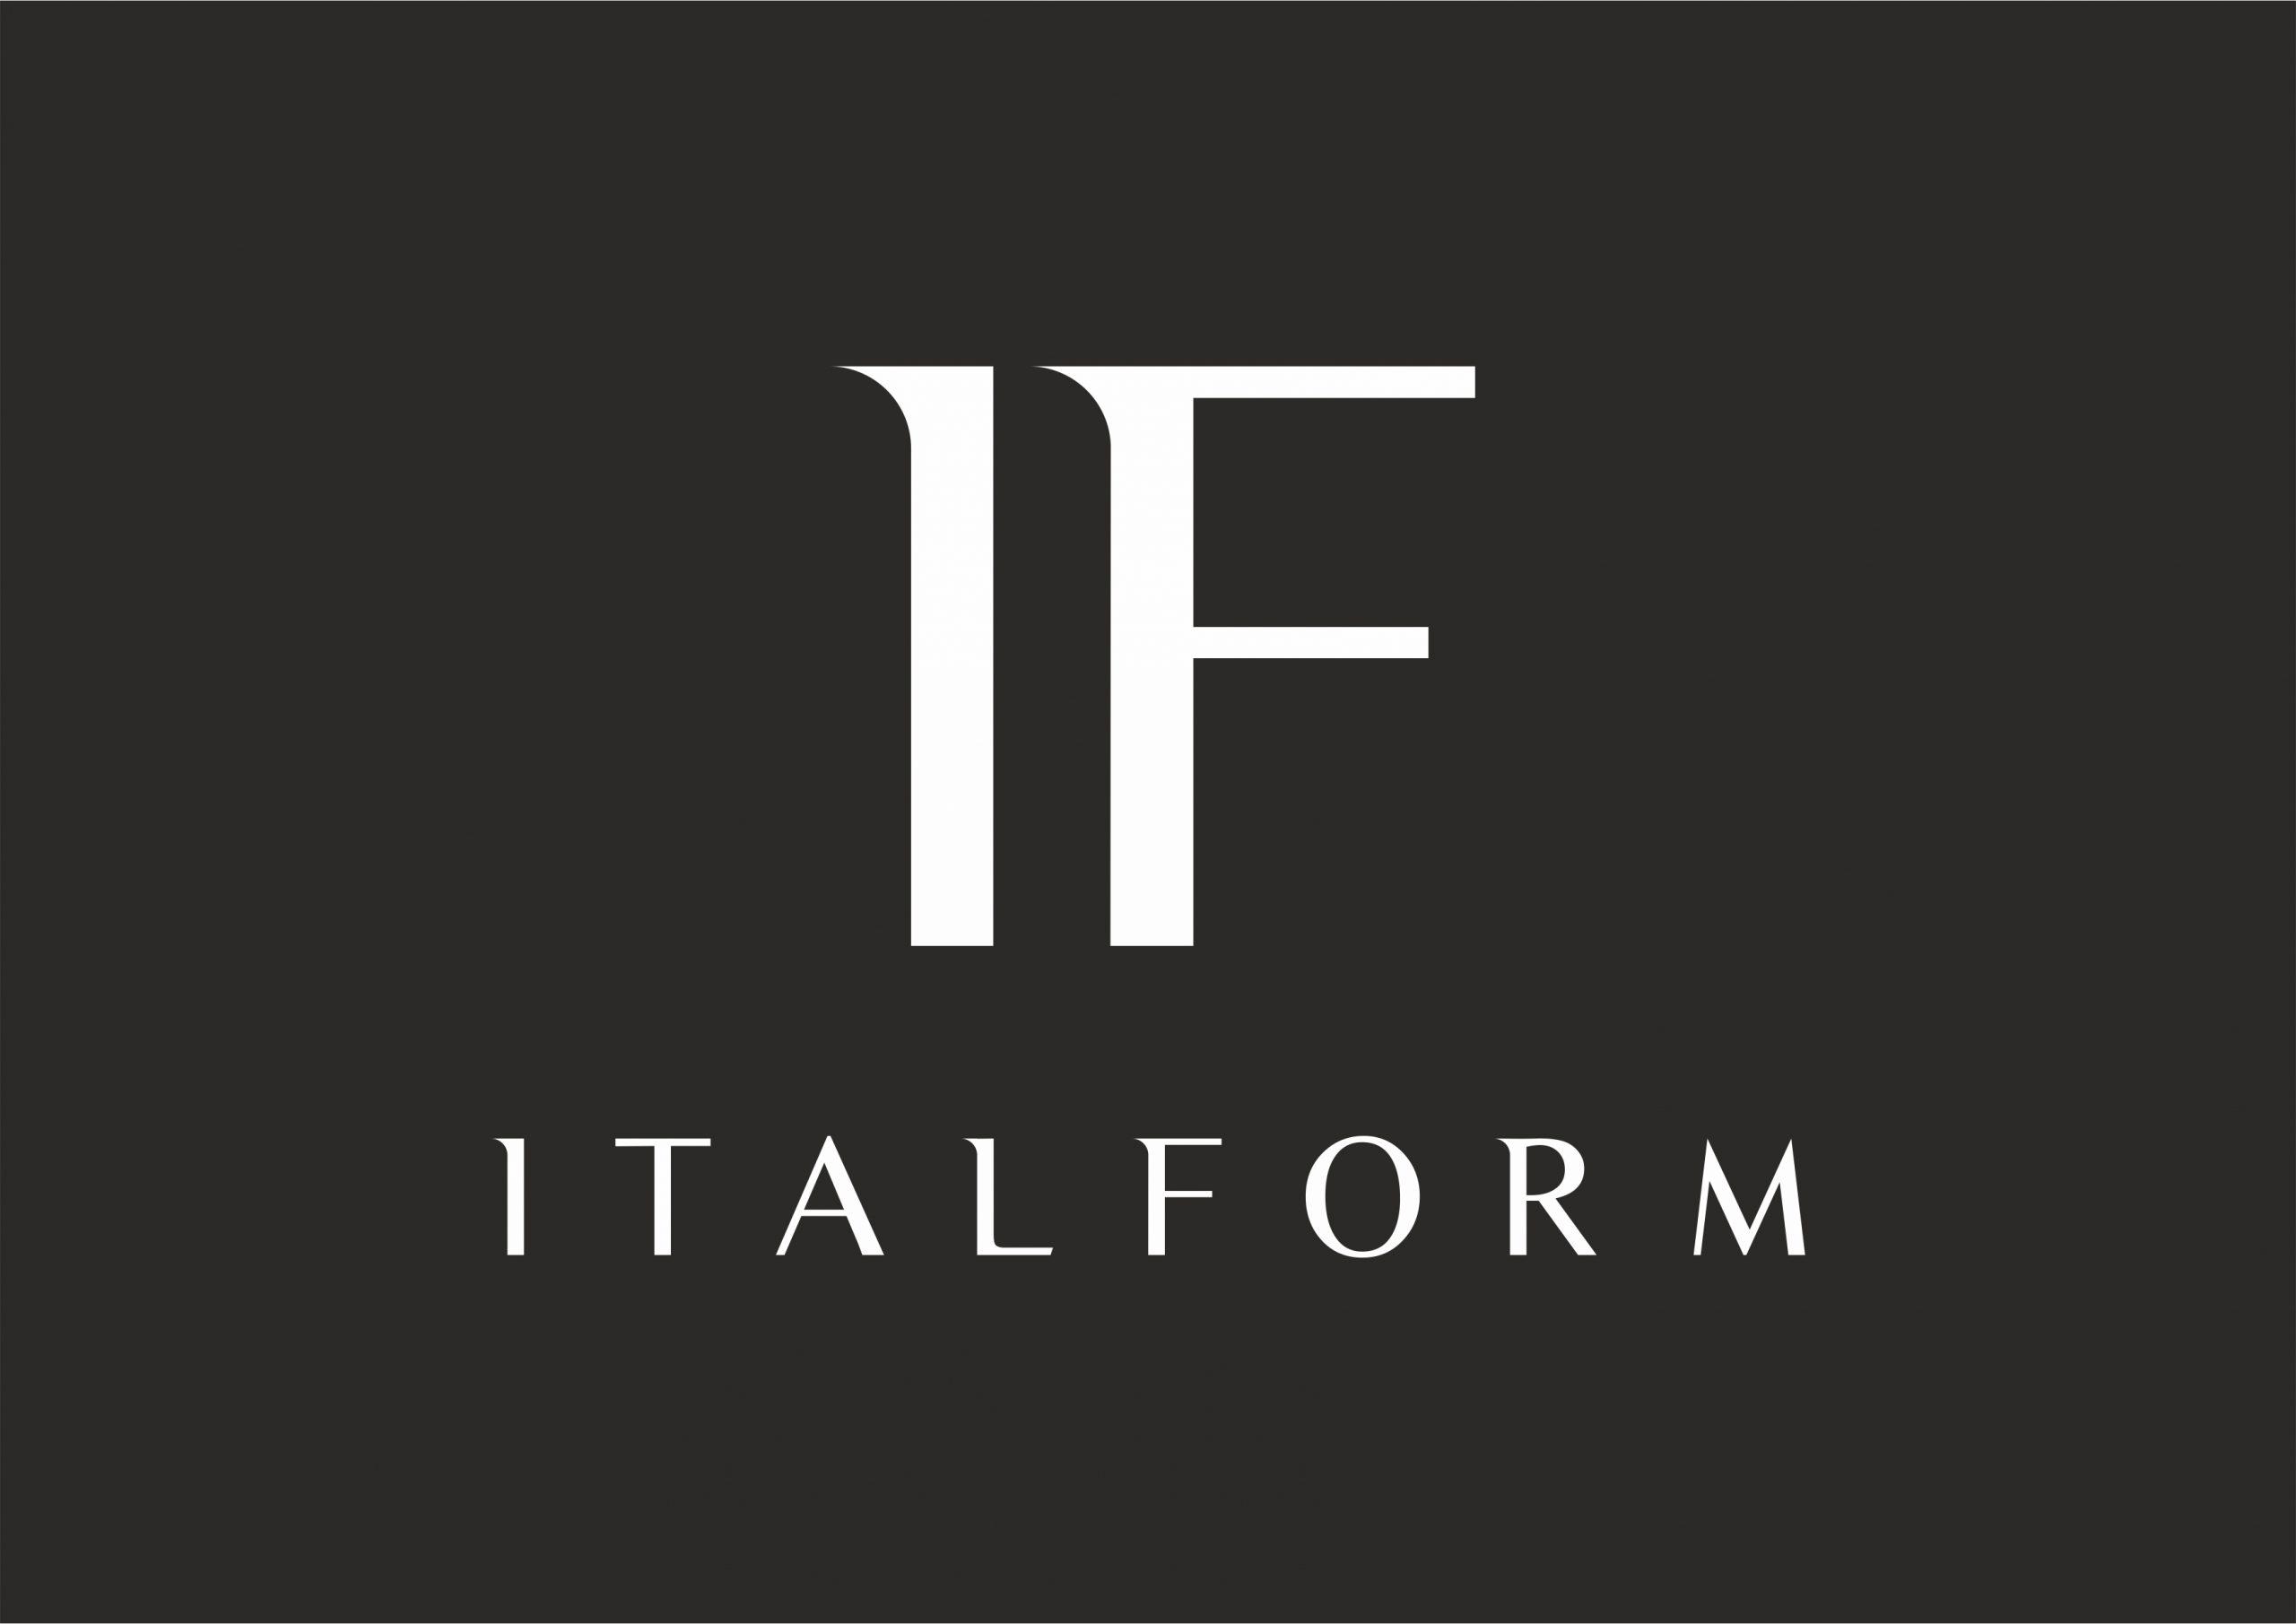 Italform